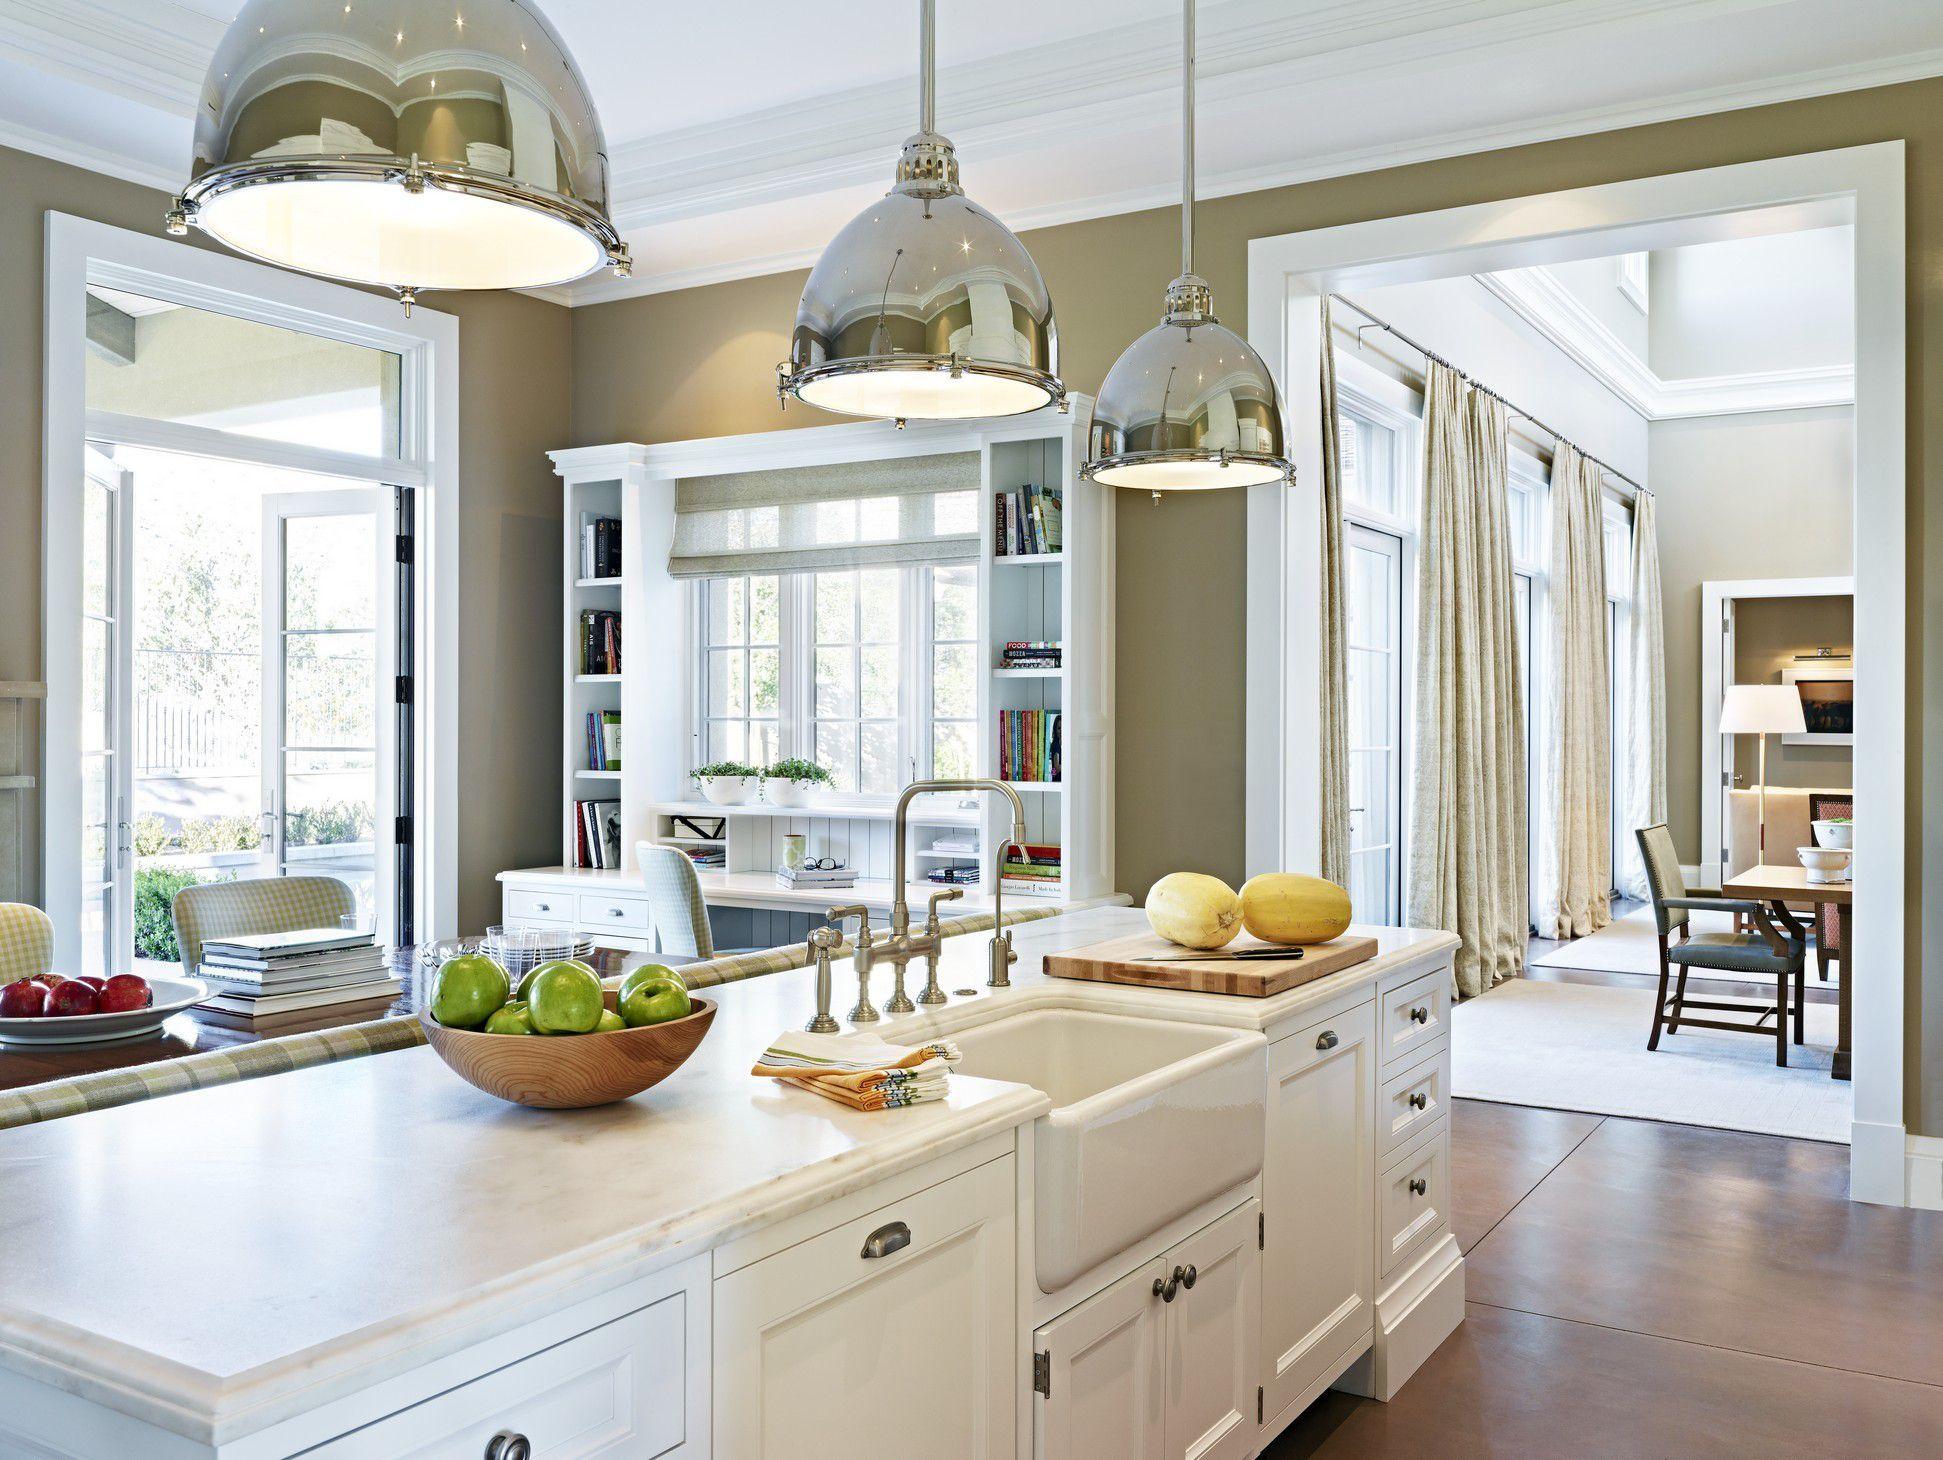 Salcito Custom Homes - Luxe Interiors + Design | Kitchen | Pinterest ...